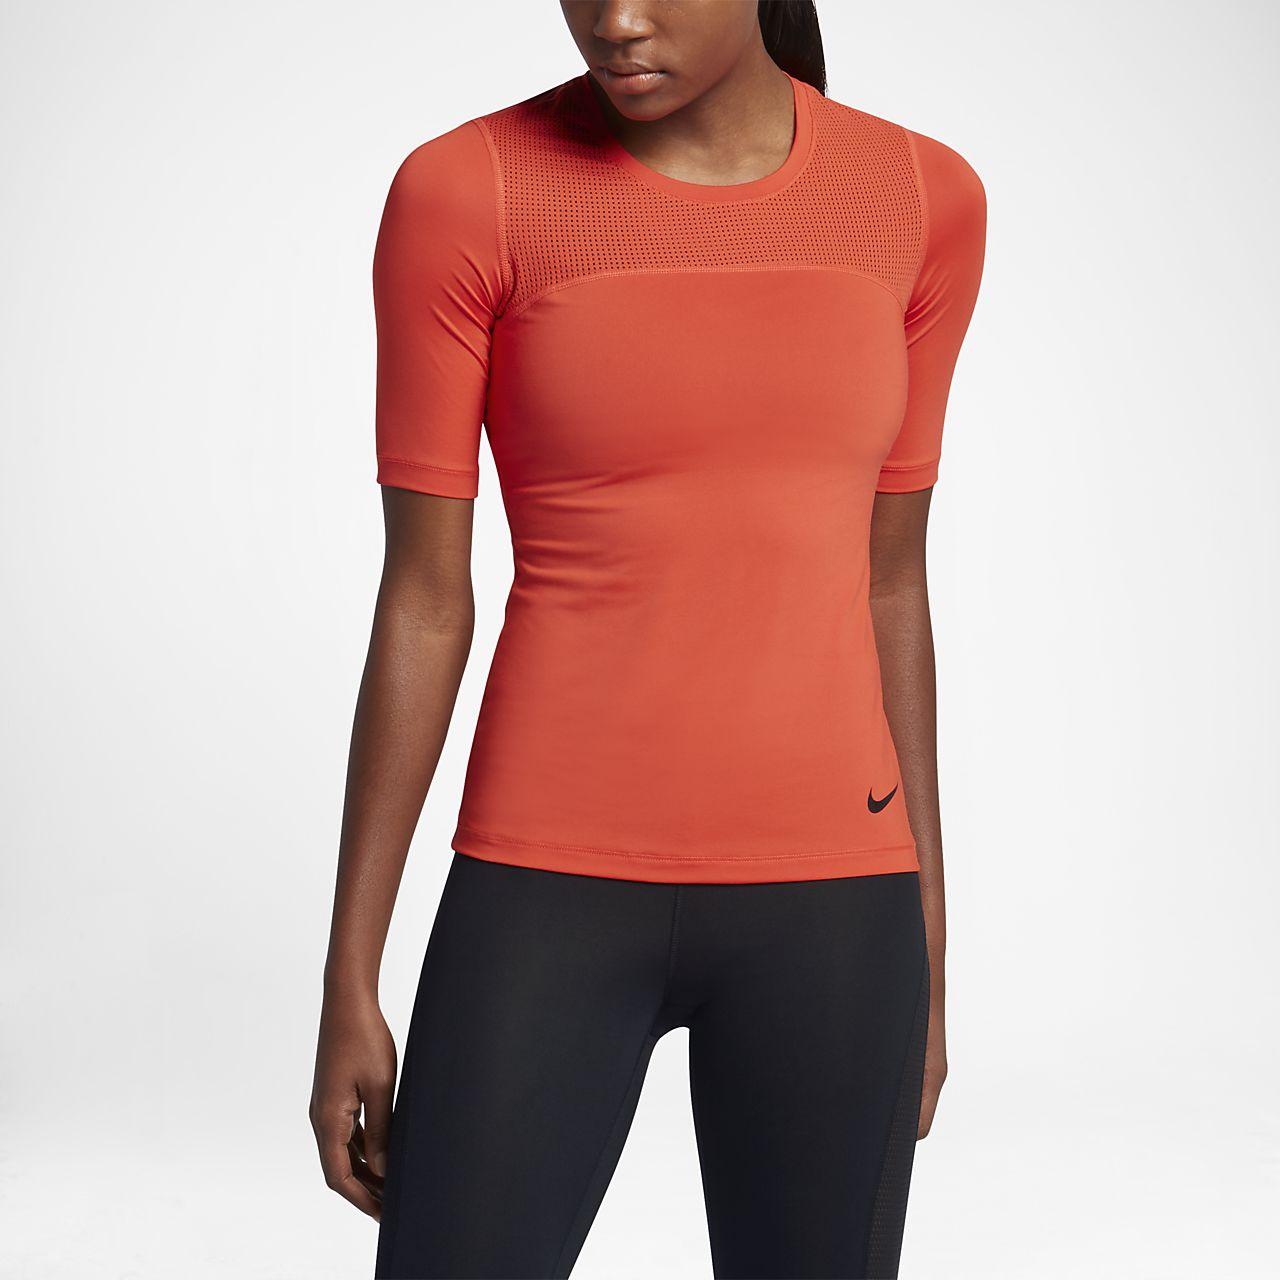 Nike Pro HyperCool Women's Short Sleeve Training Tops Orange/Black